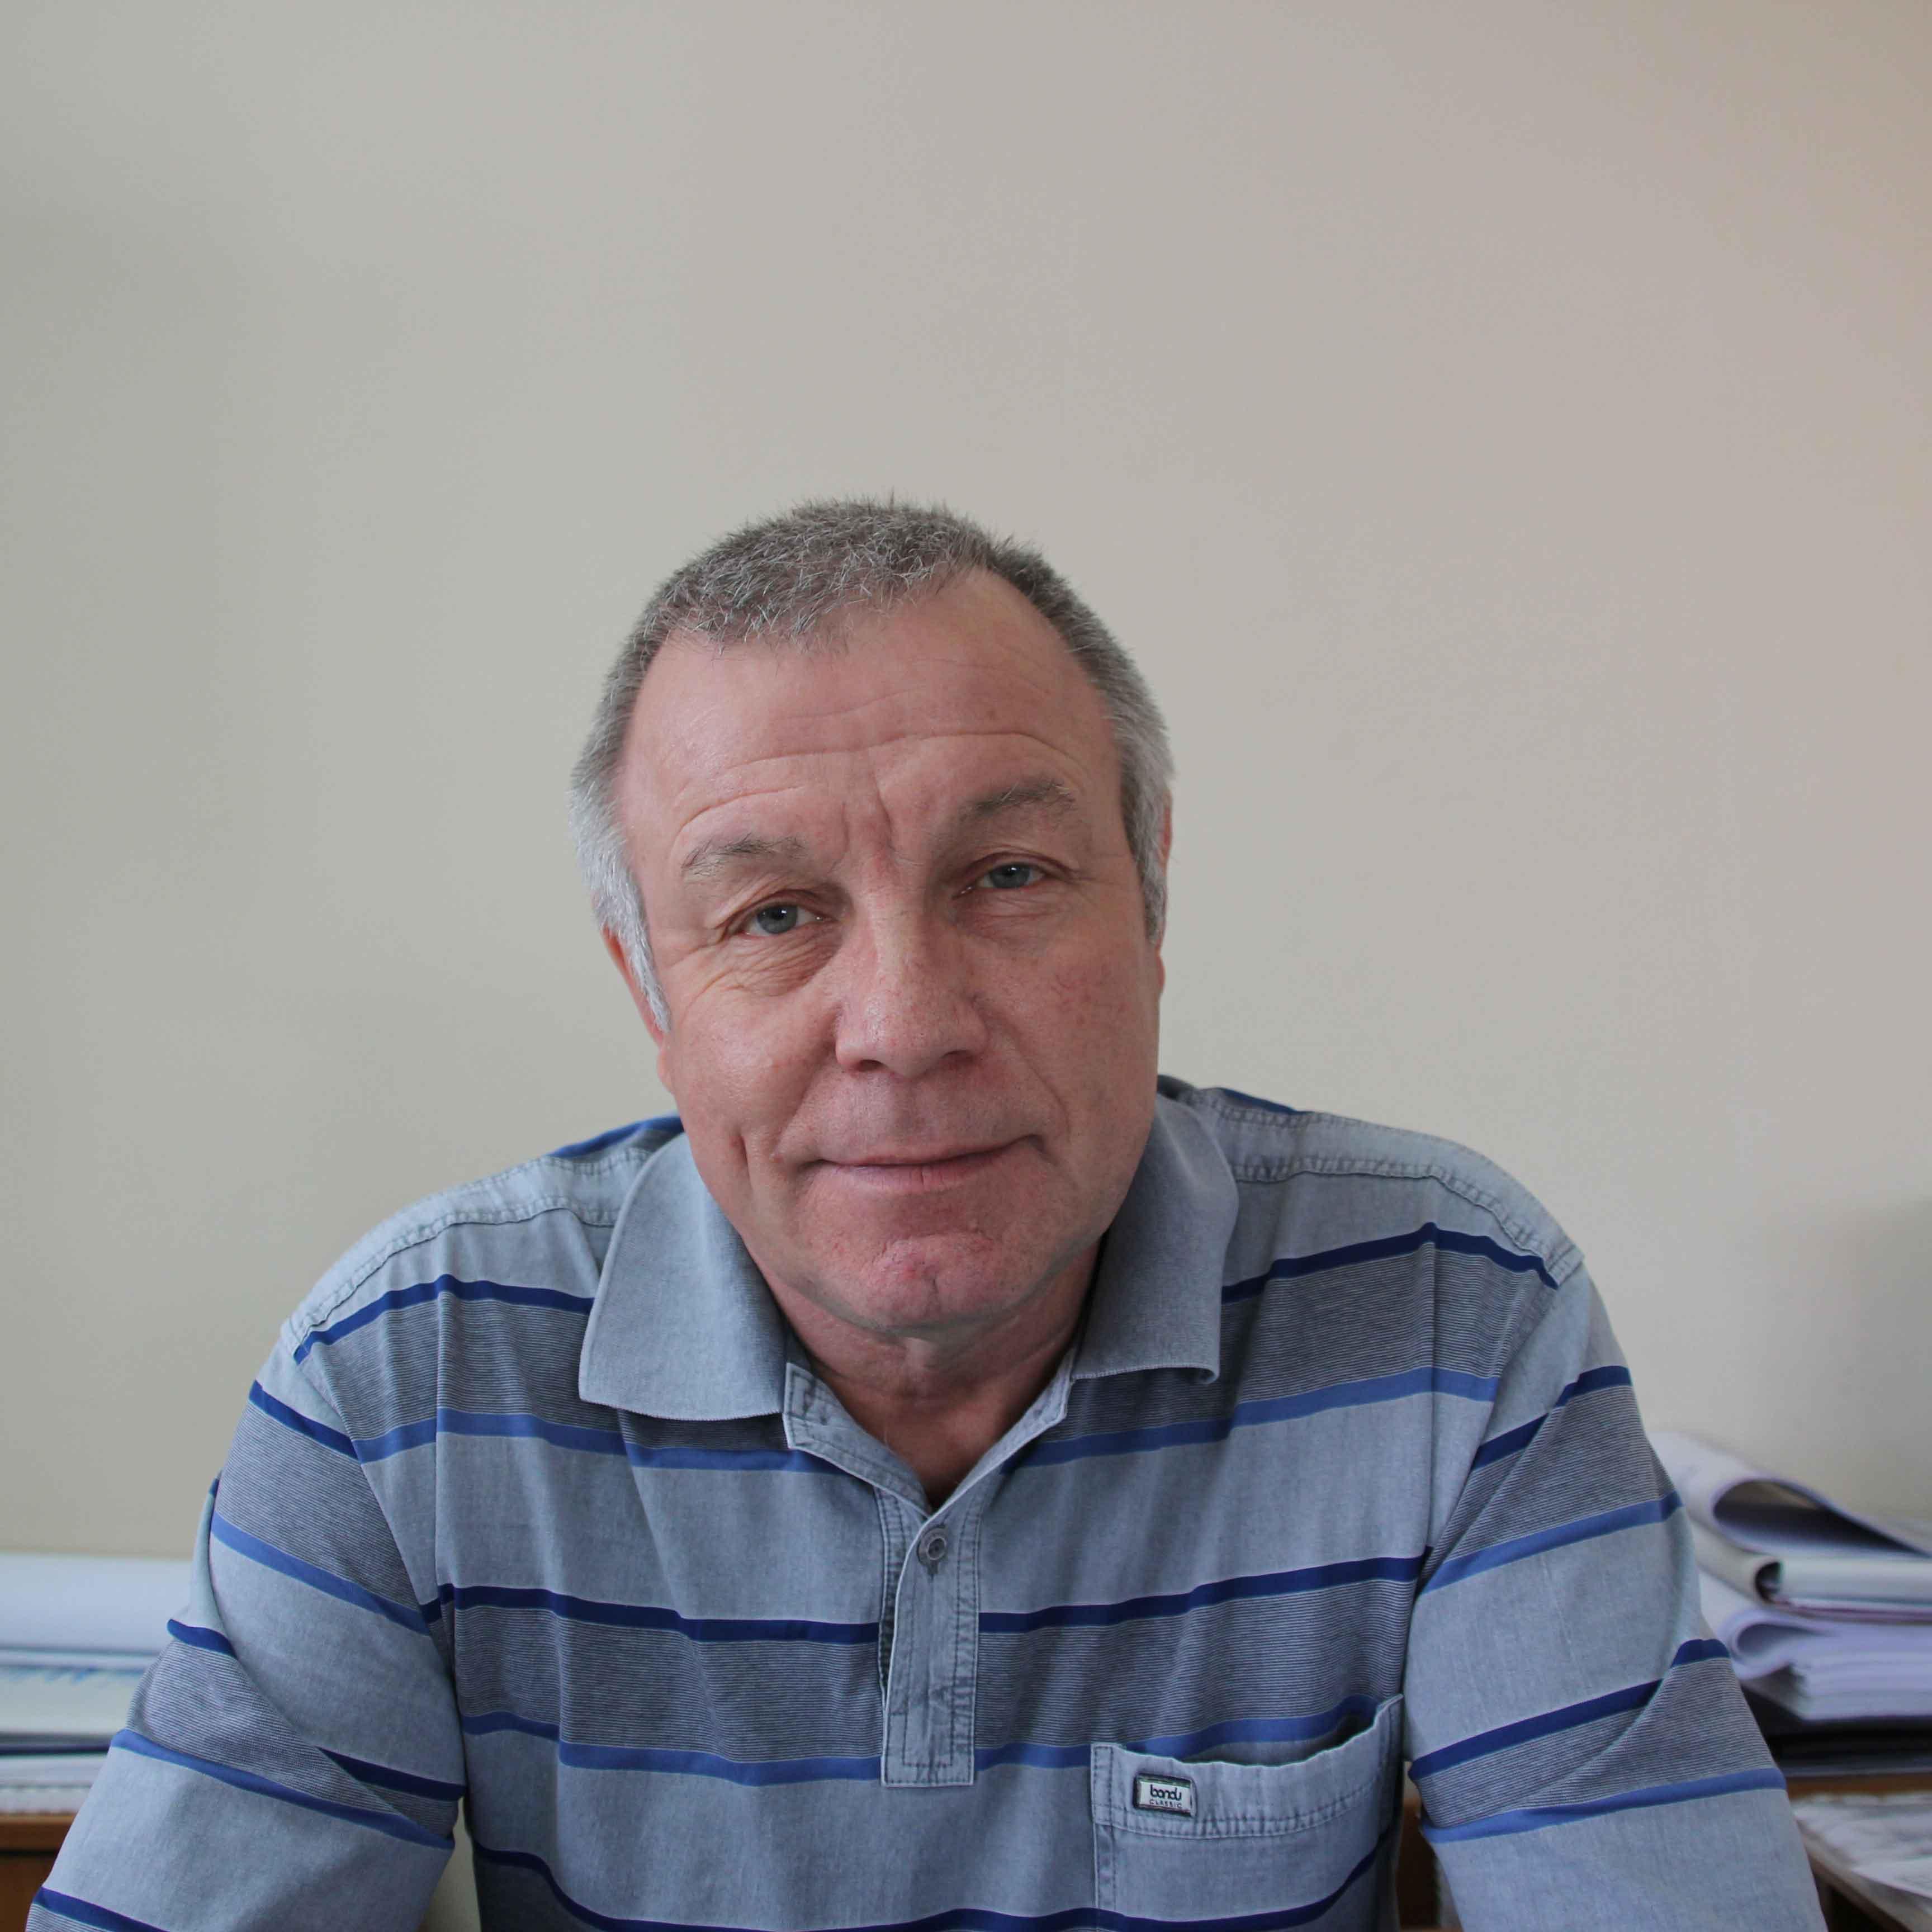 Отдел отопления и вентиляции. Янковский Геннадий Антонович